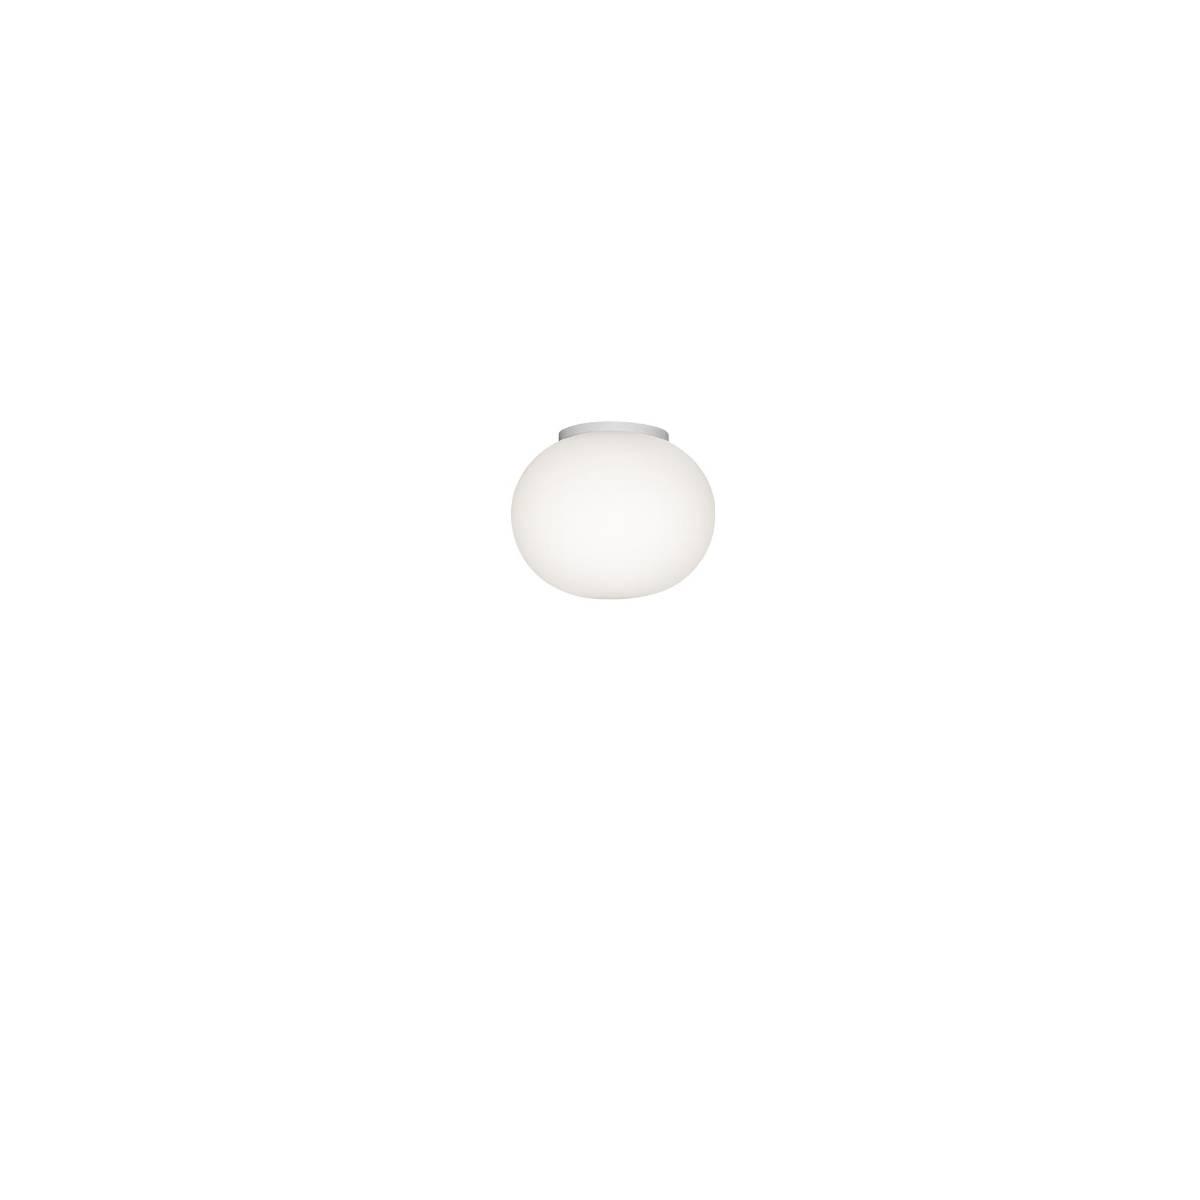 Flos Mini Glo-Ball C-W Mirror Wandlamp-Plafondlamp